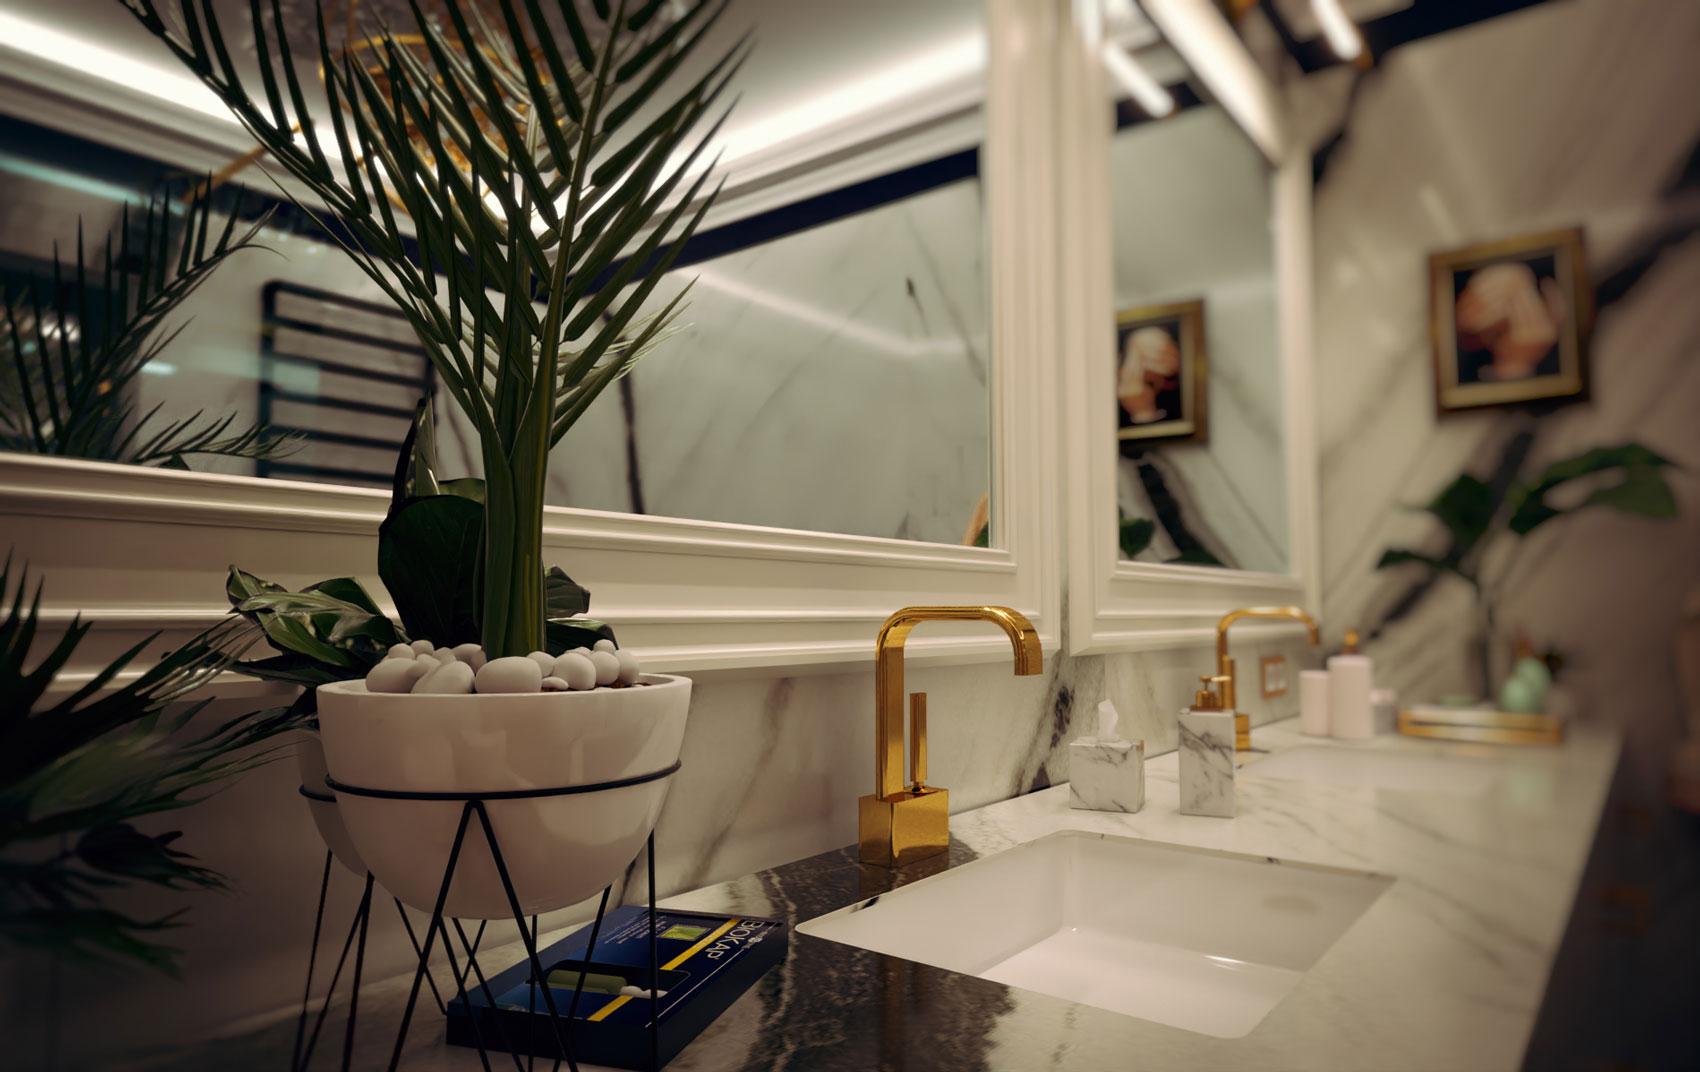 bathroom archviz - Bitopia 3D rendering studio